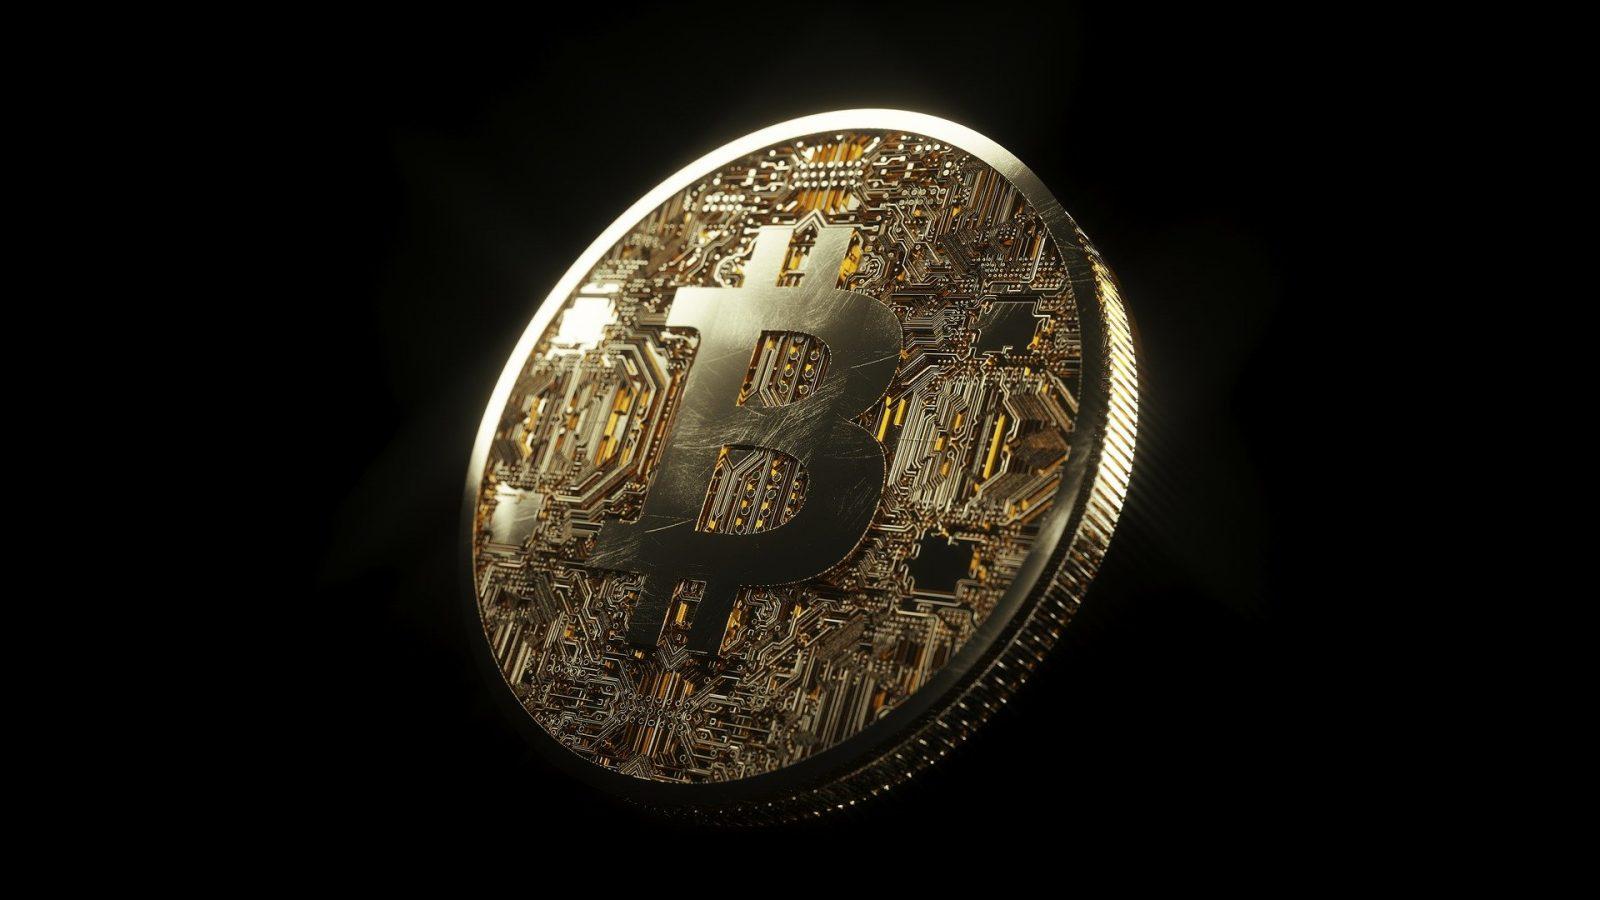 Bitcoin closes in on $40,000 as Elon Musk and Tanzania give the markets a lift - CityAM